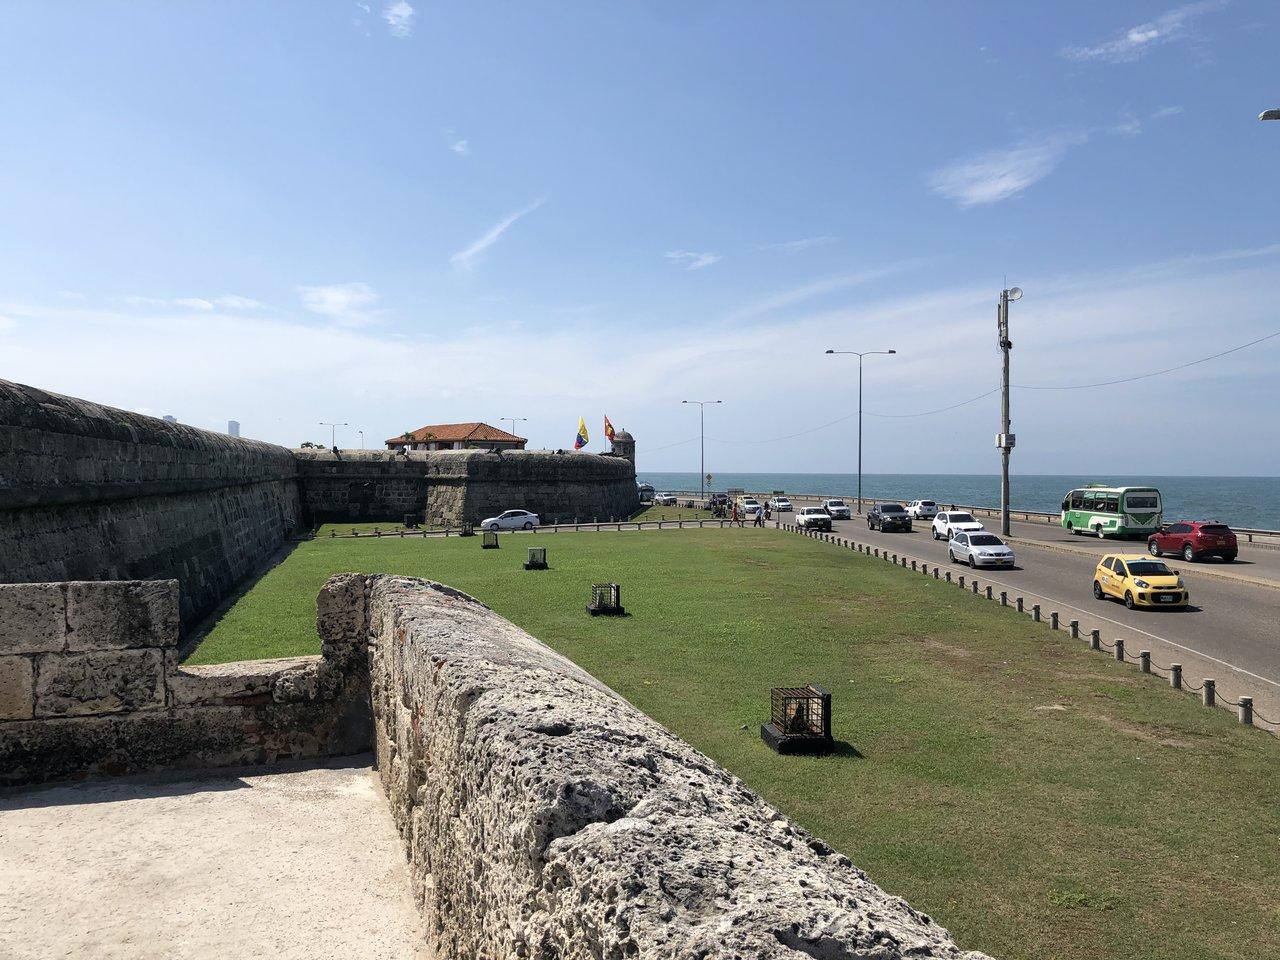 Cartagena | Photo taken by Rachel B